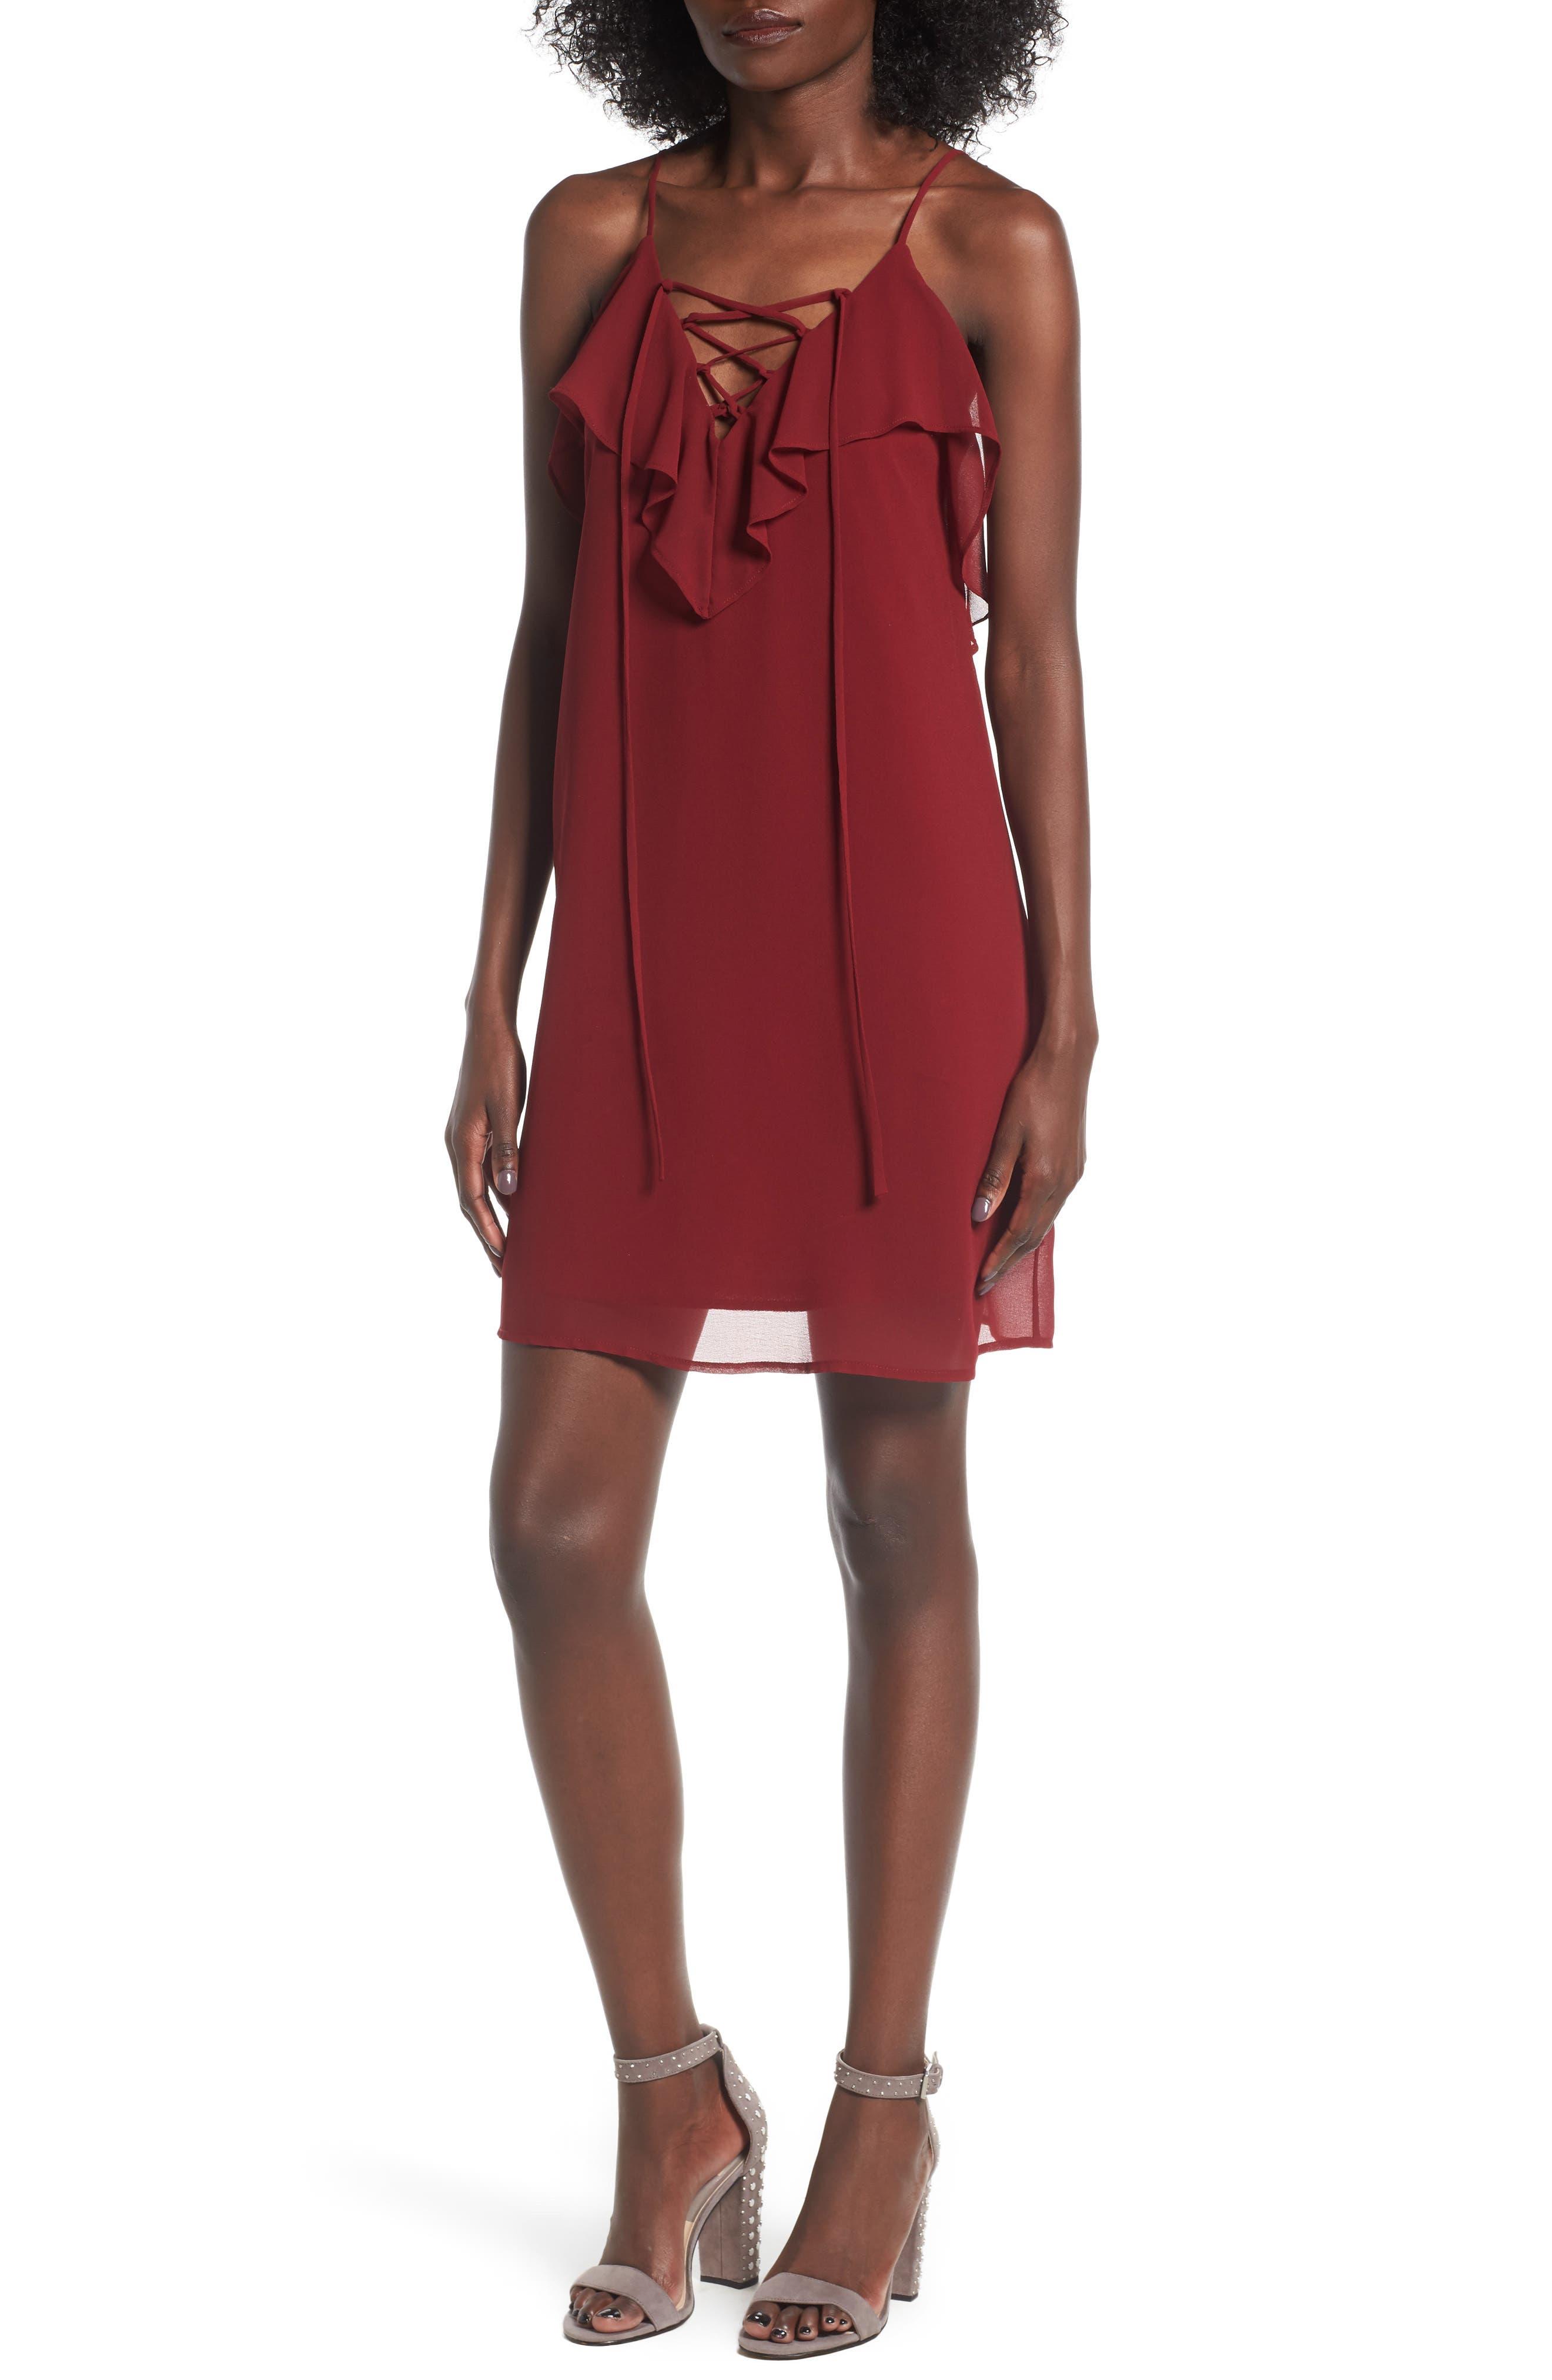 Soprano Lace-Up Camisole Dress